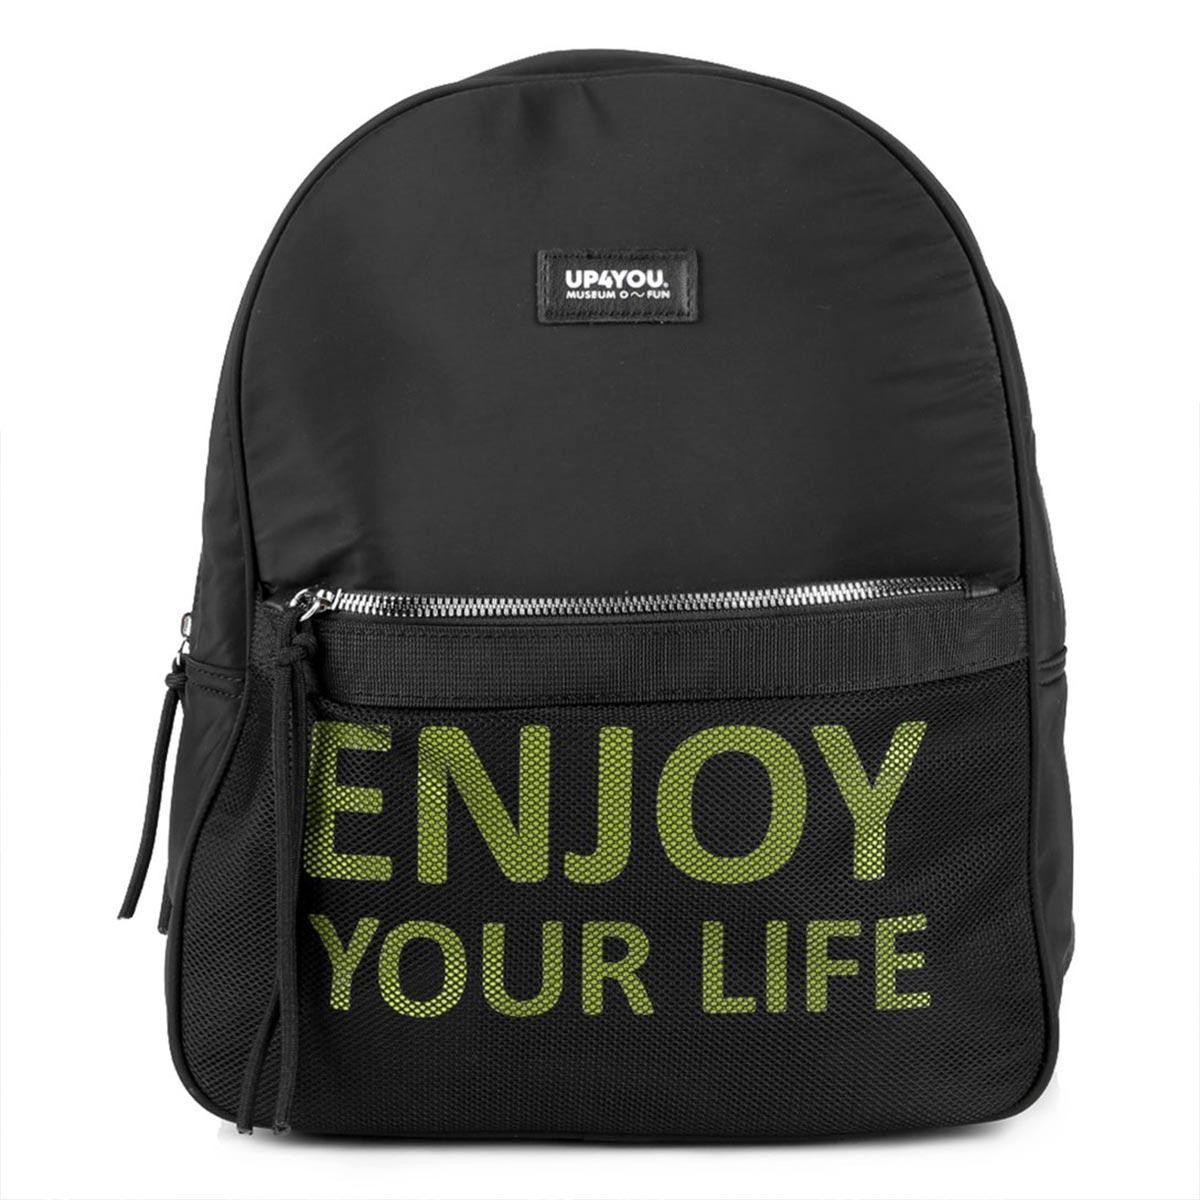 Mochila Feminina Bolso Frontal Estampa Frase Enjoy Your Life